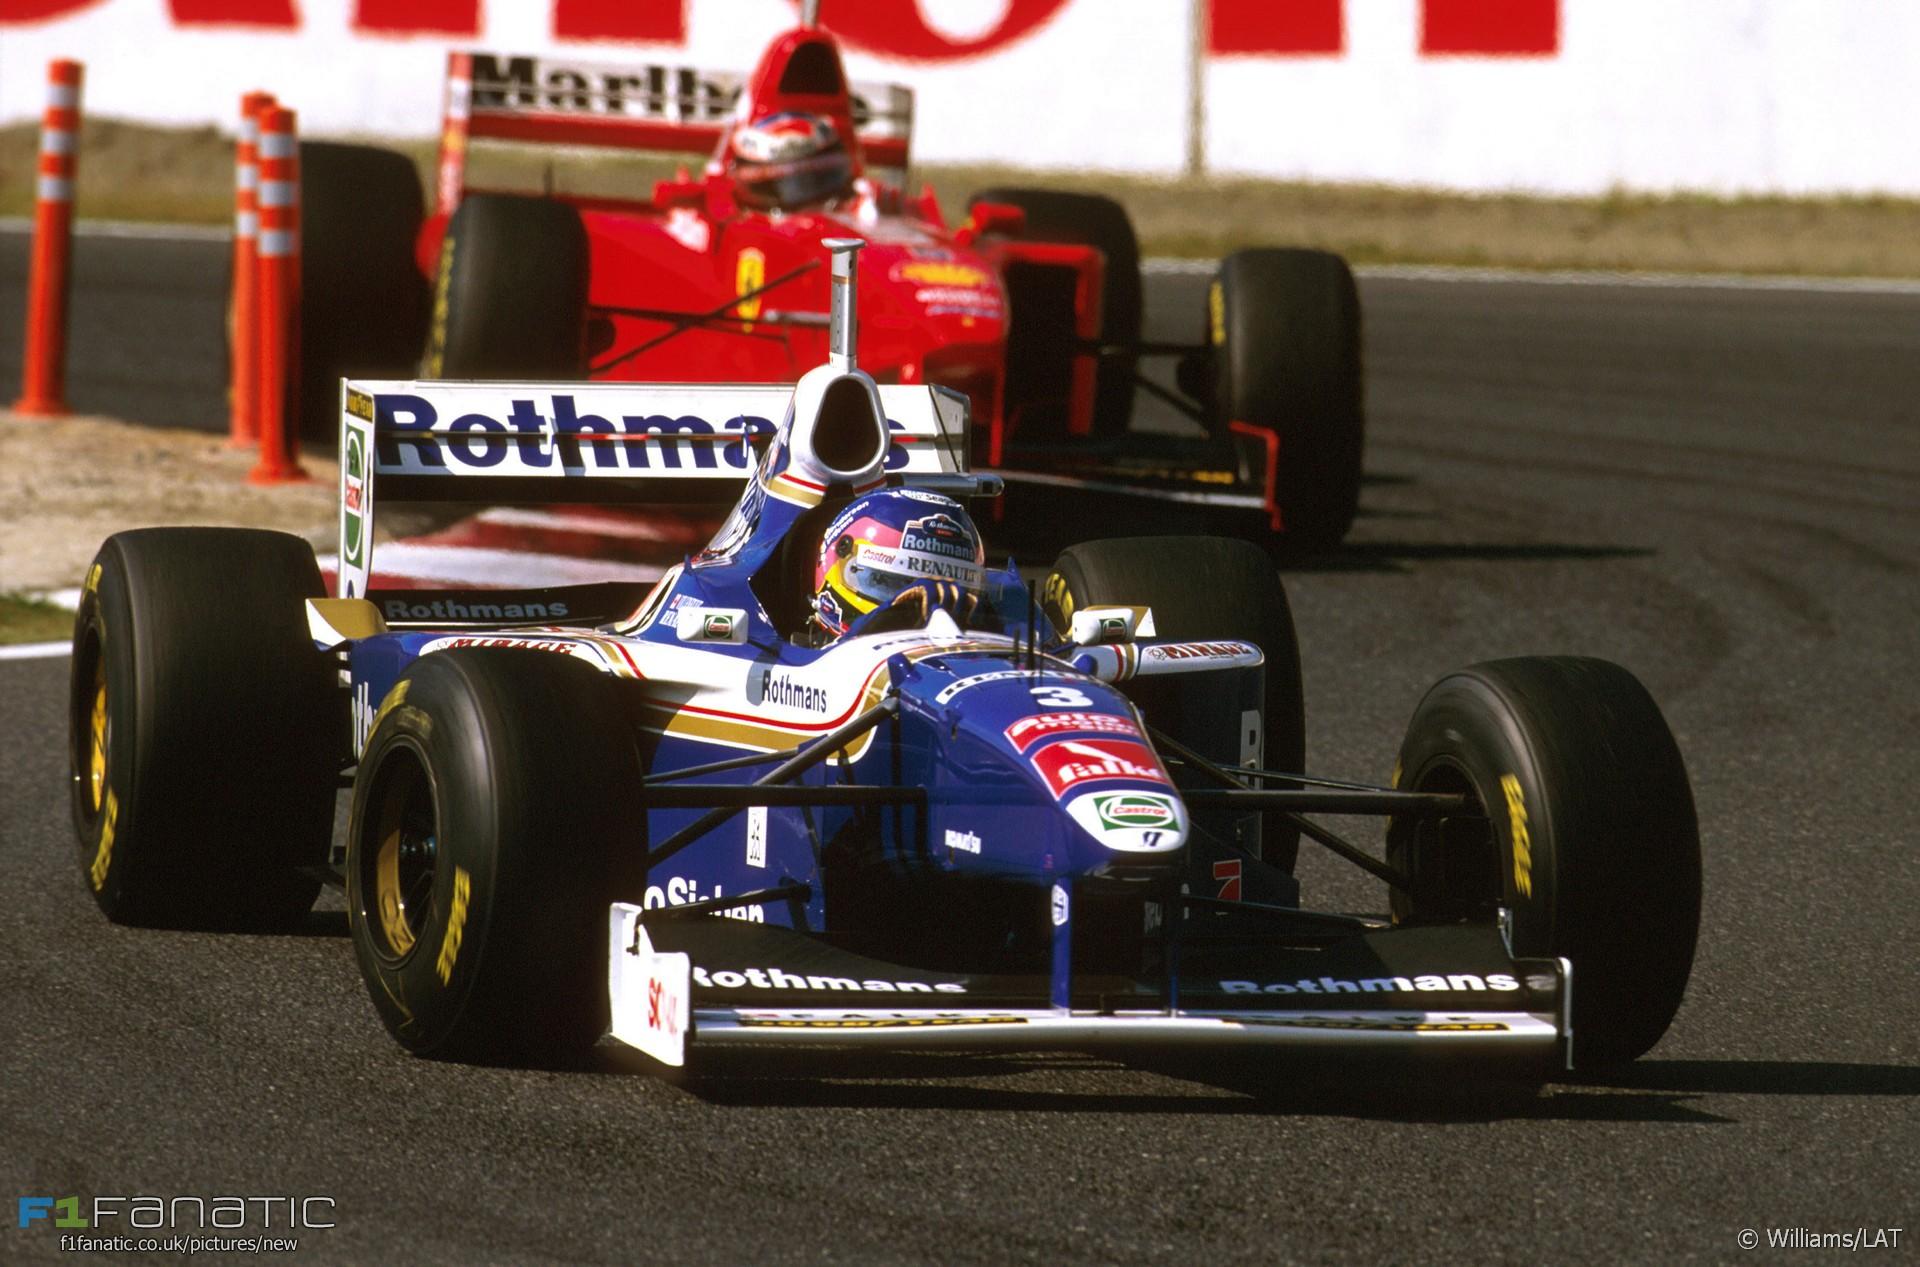 Jacques Villeneuve, Michael Schumacher, Suzuka, 1997